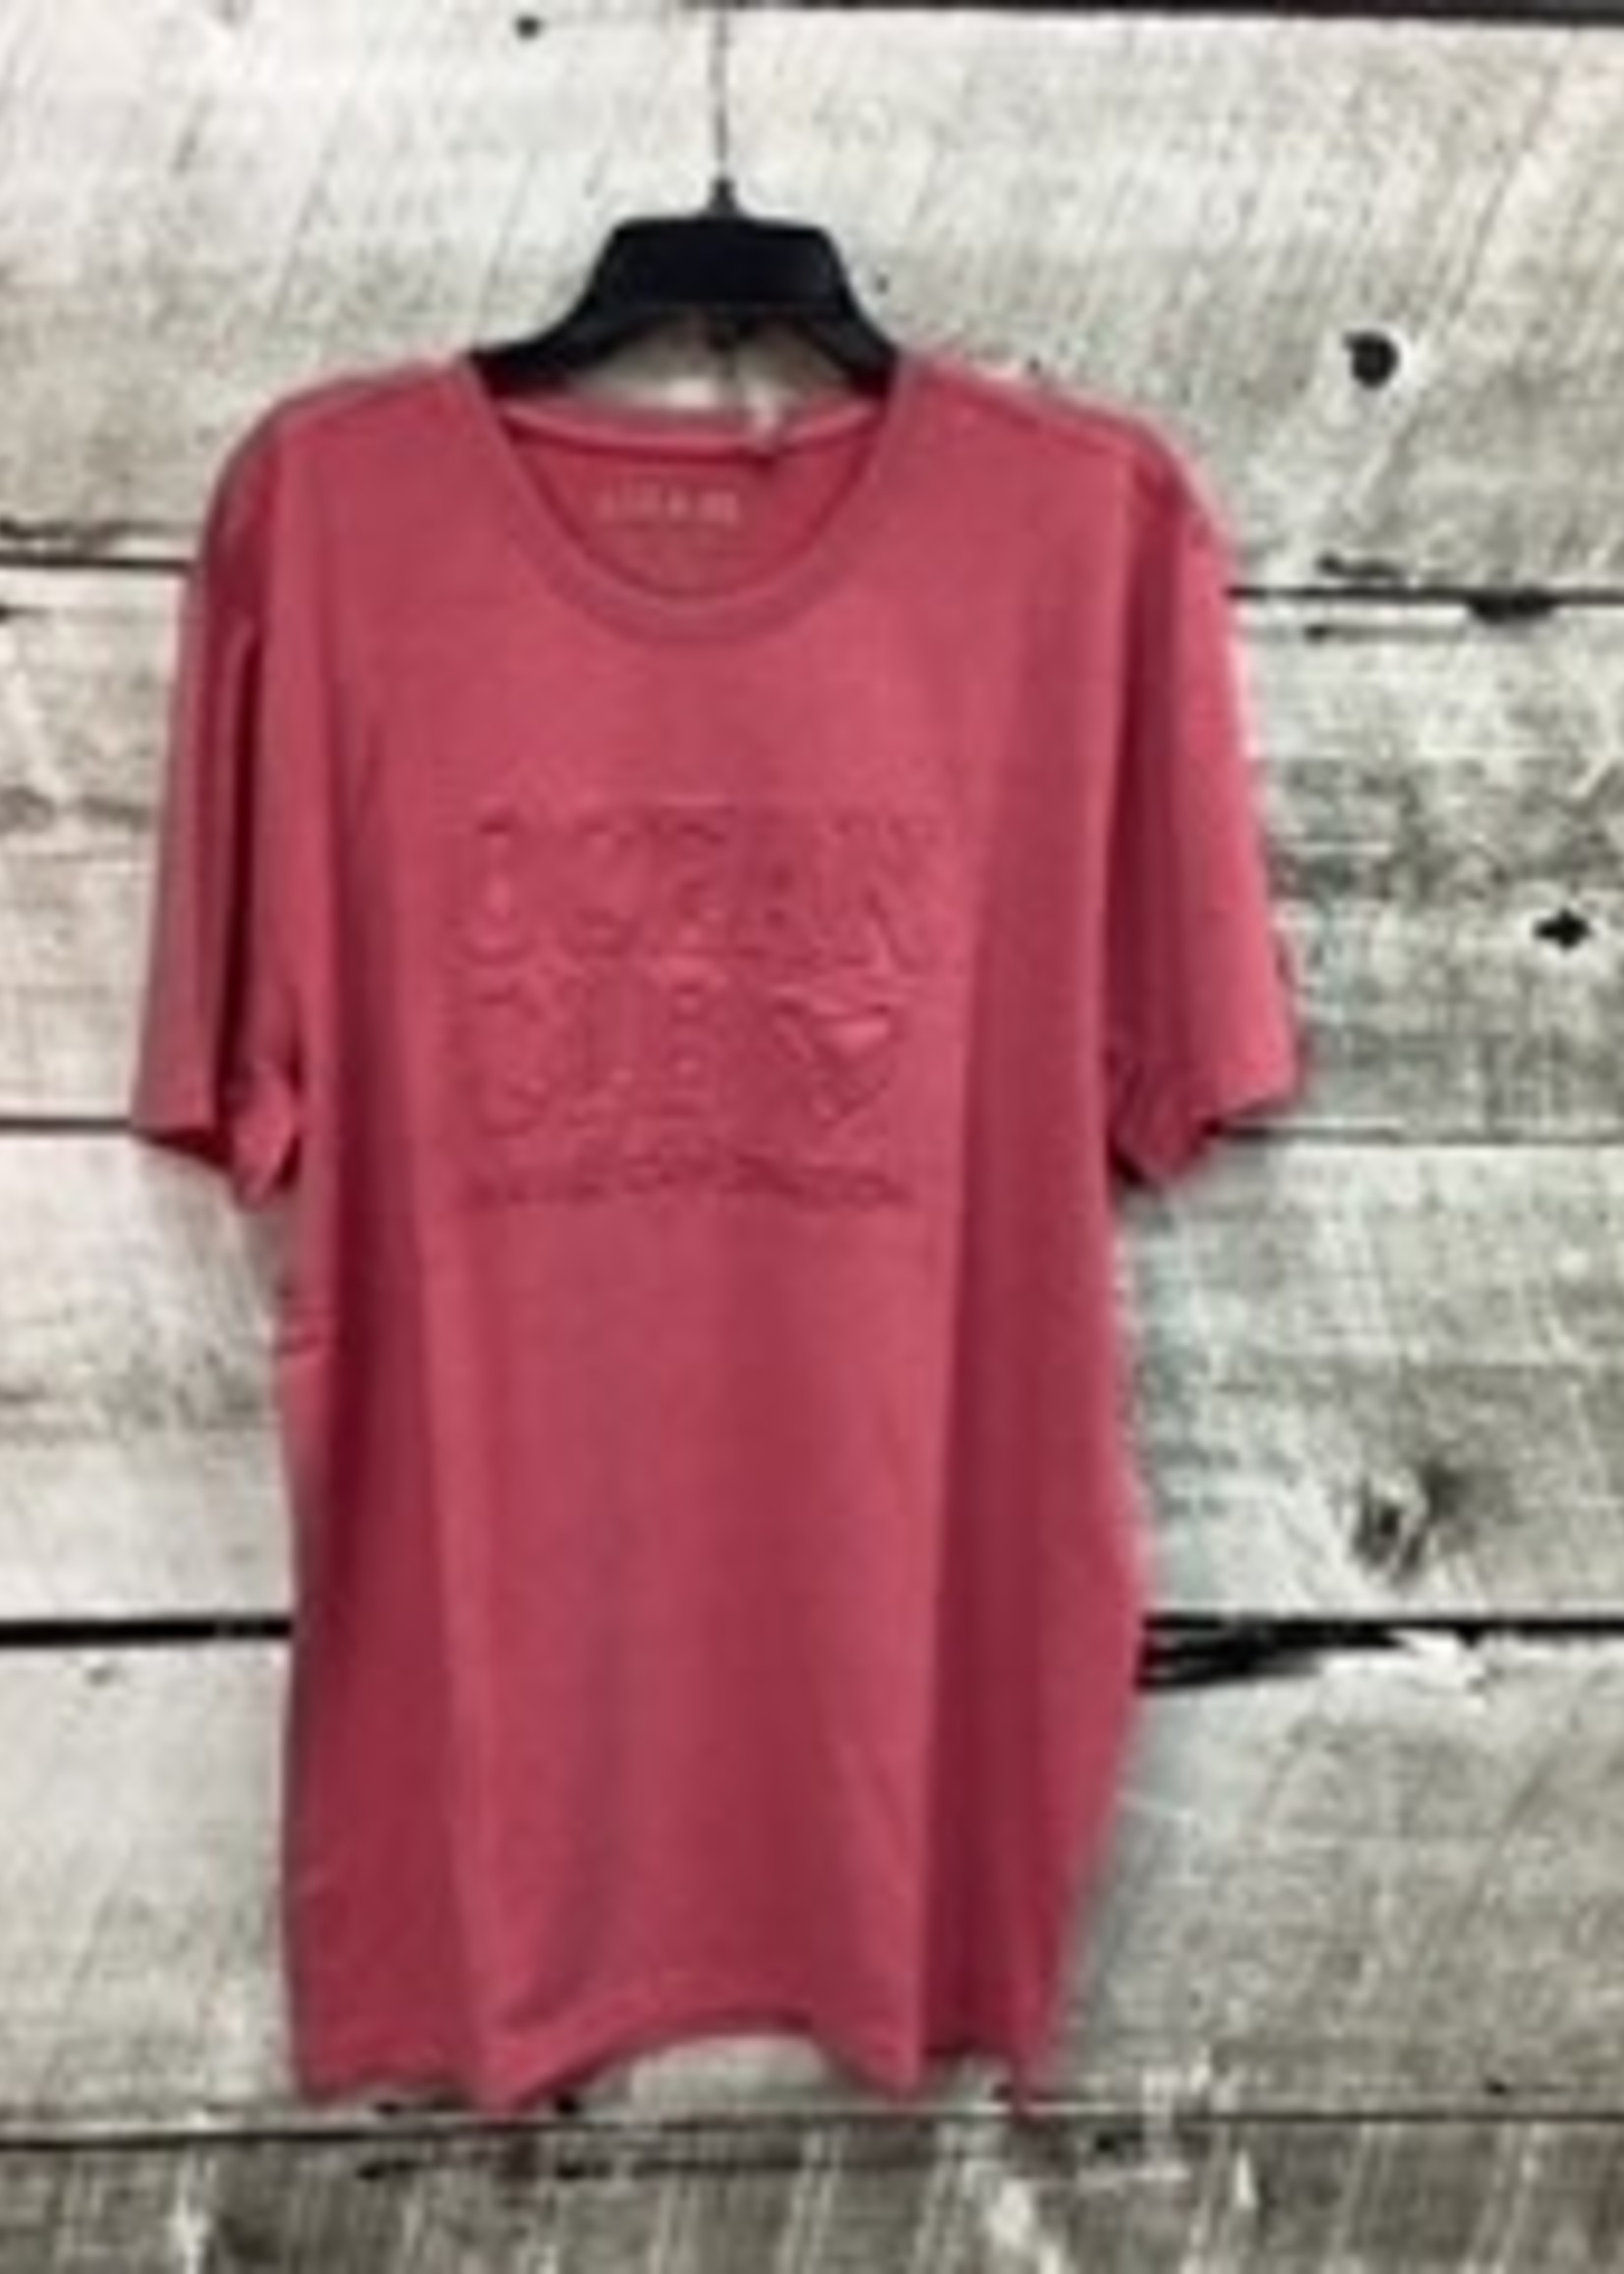 GIGA Ederra MN Tshirt 36885